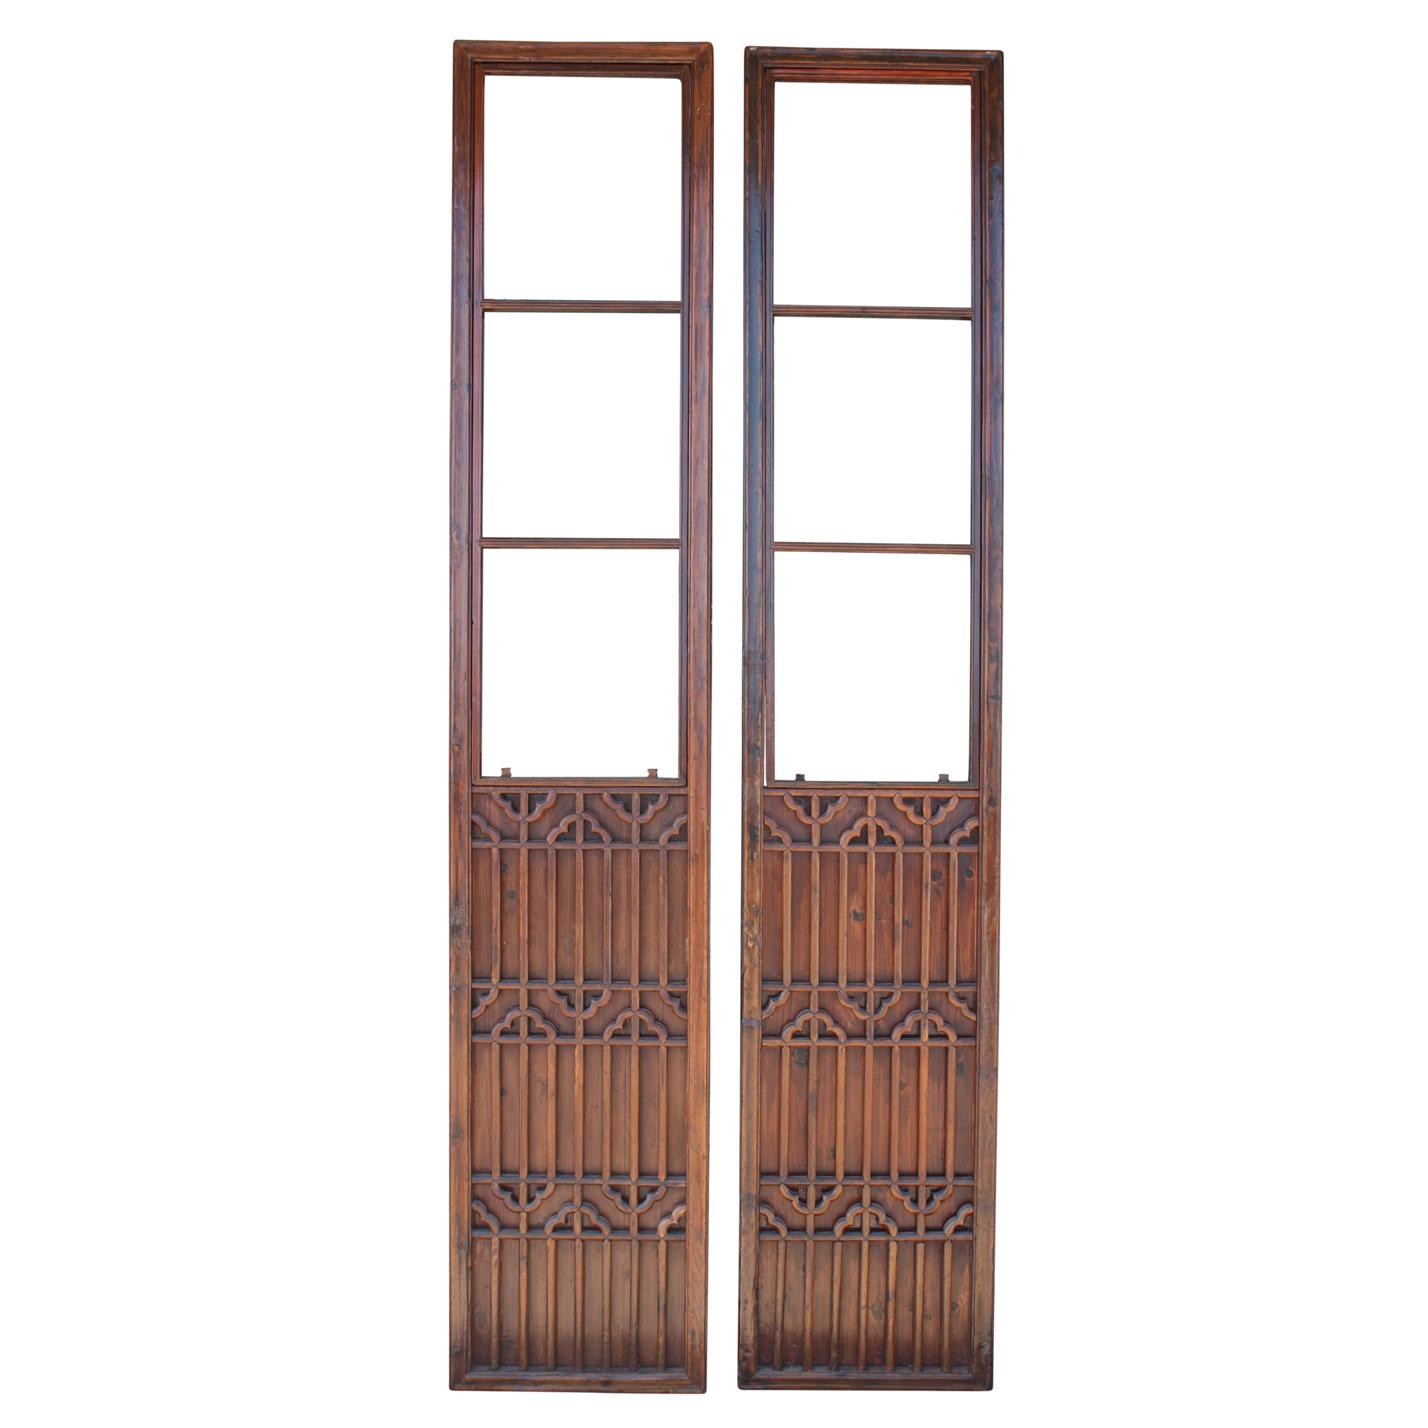 sc 1 st  Shen\u0027s Gallery & Shen\u0027s Gallery | Chinese Antiques | Door | Bay Area